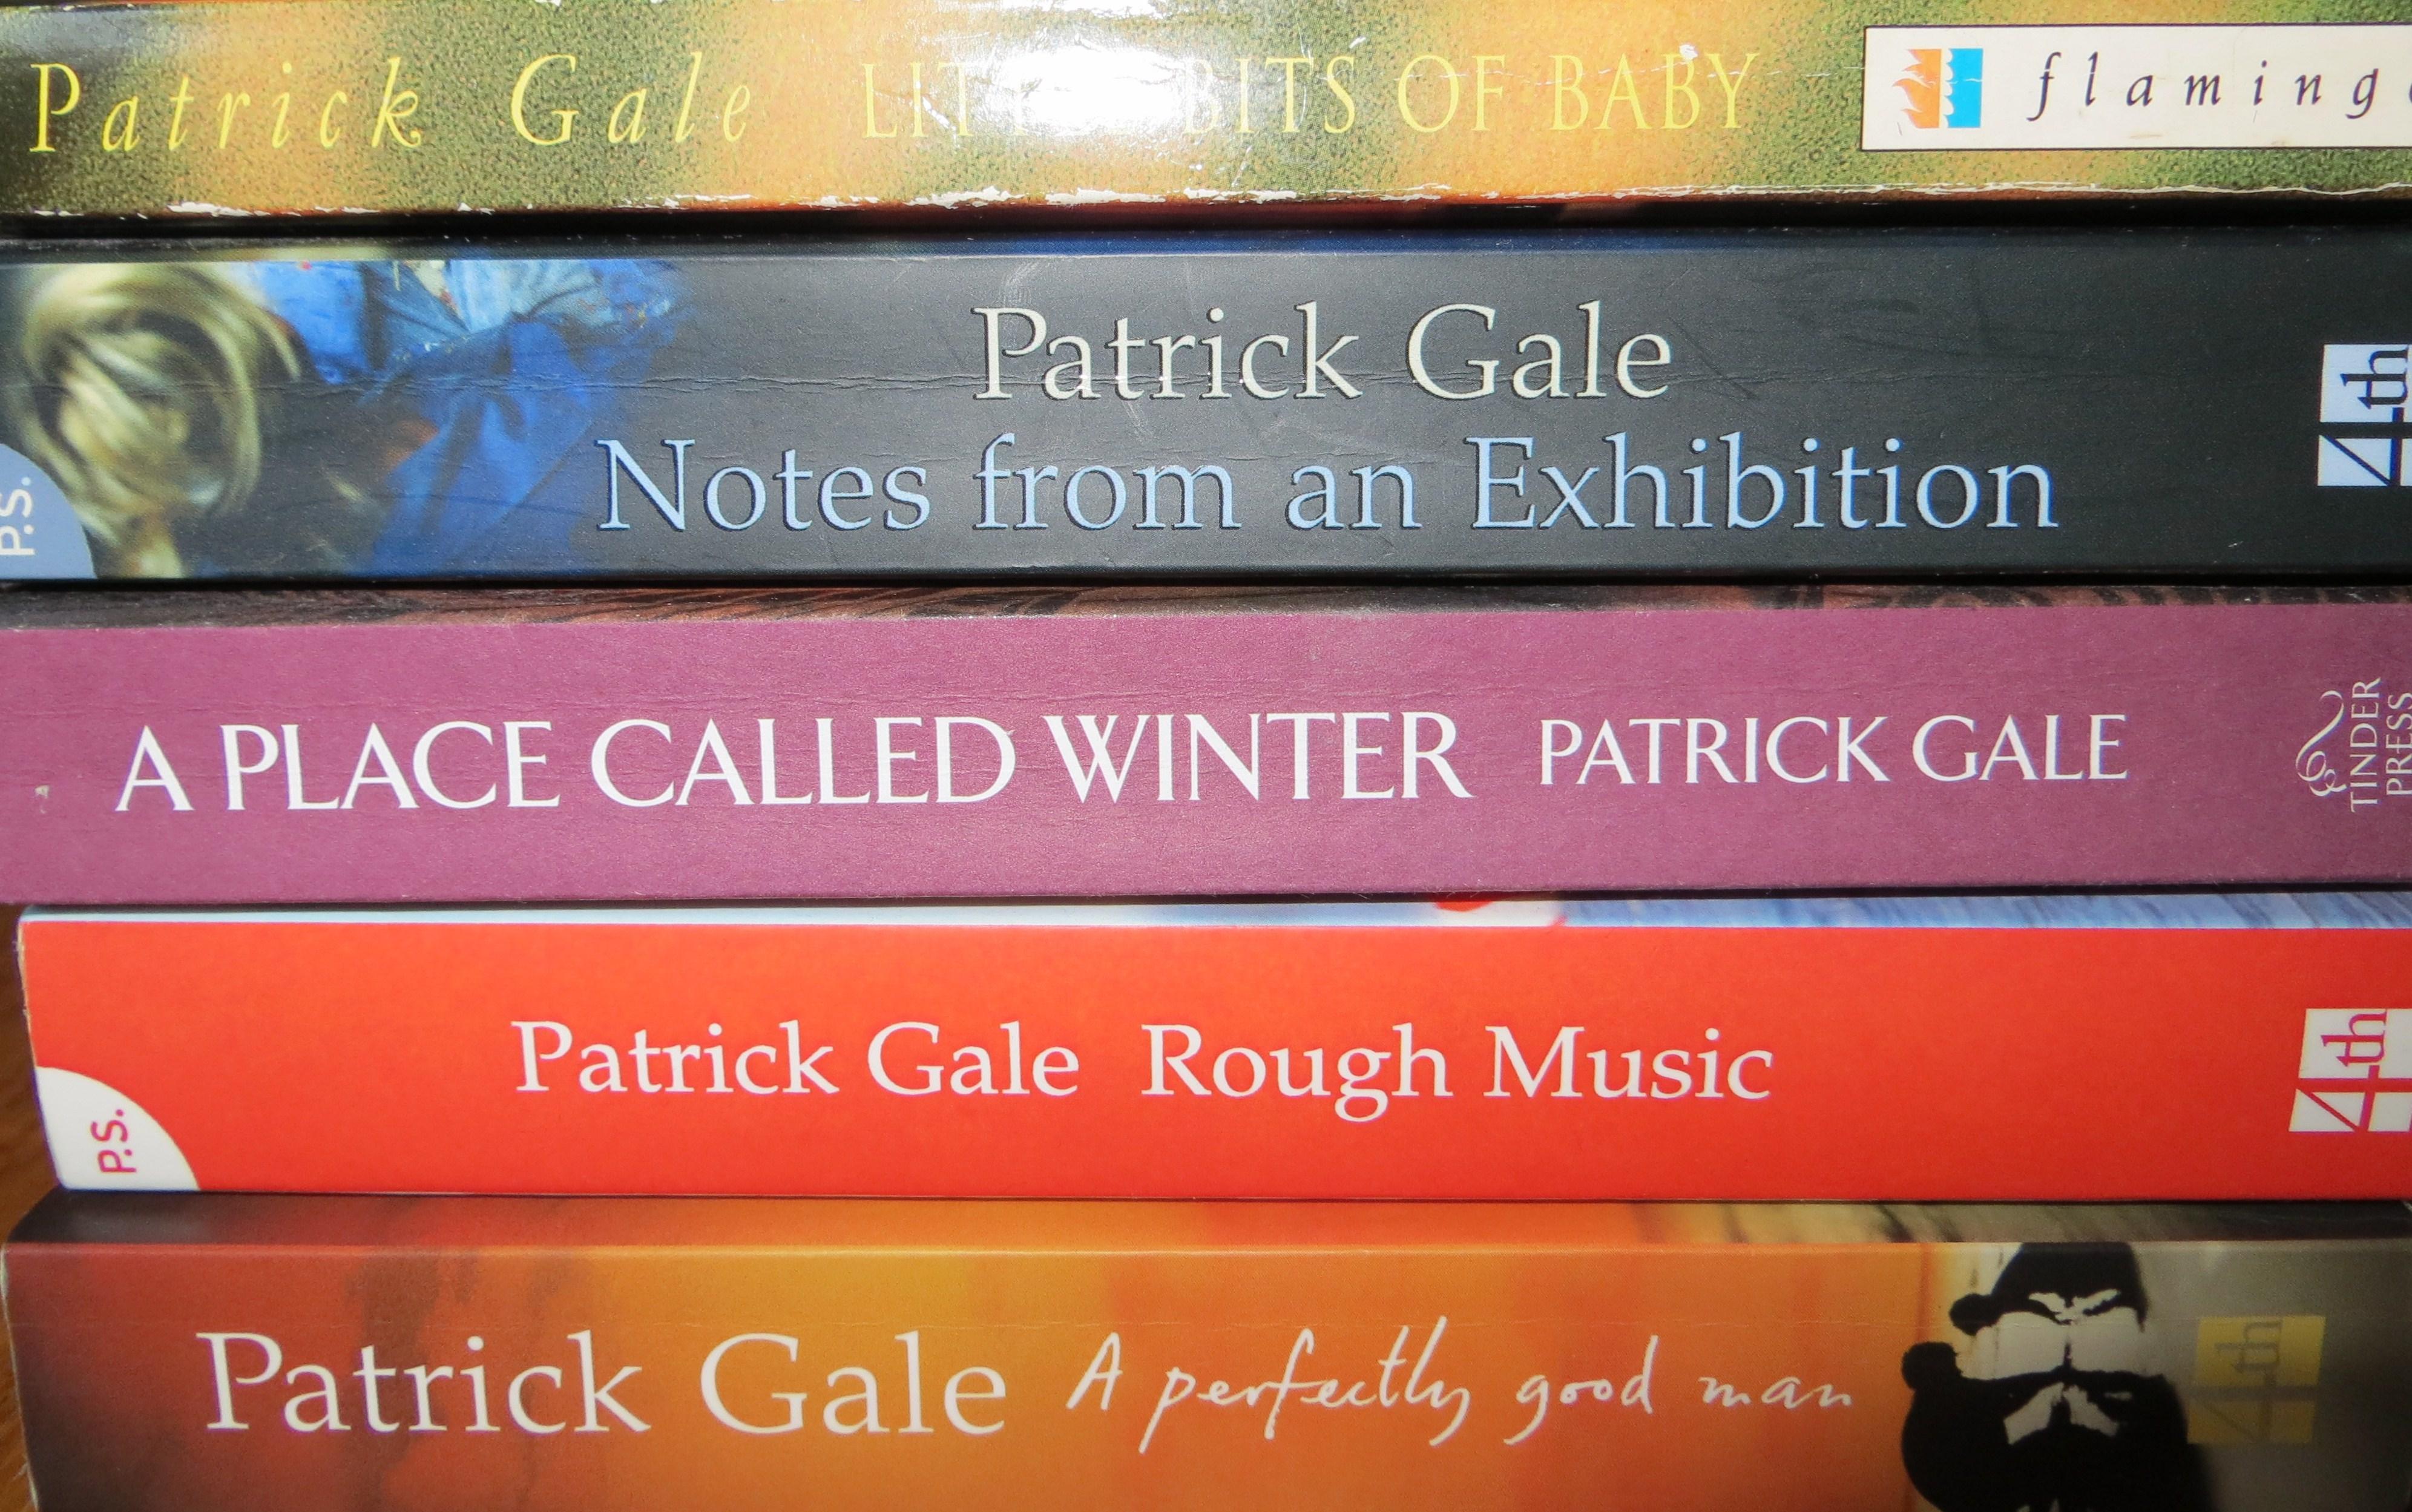 Patrick Gale's novels